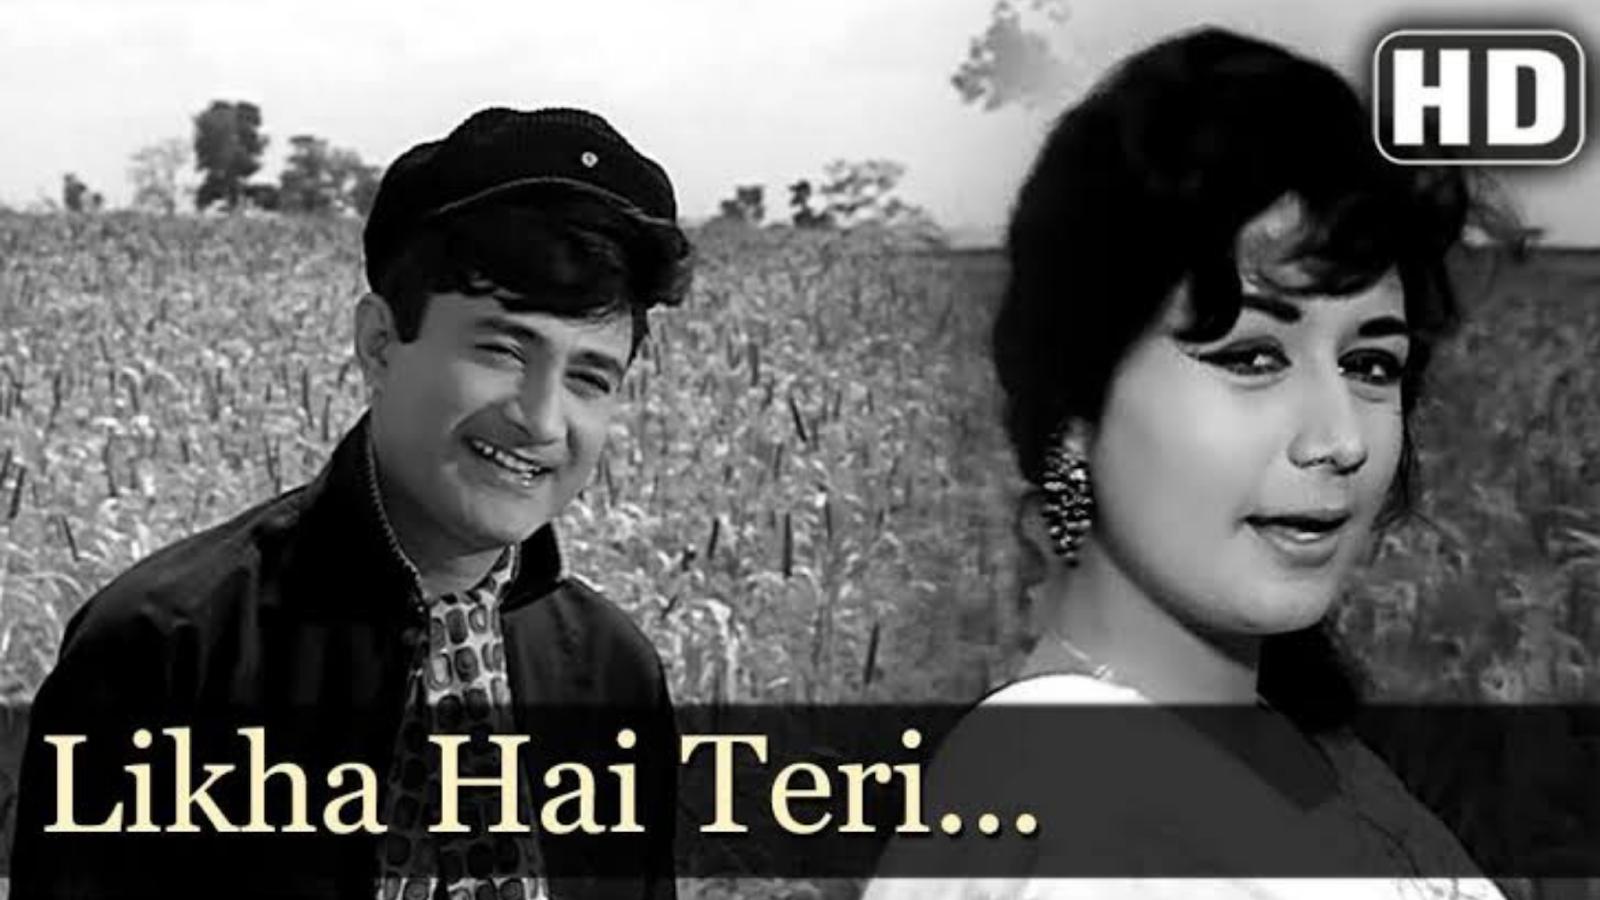 Likha Hai Teri Aankhon Mein Song Gaana Pehchaana